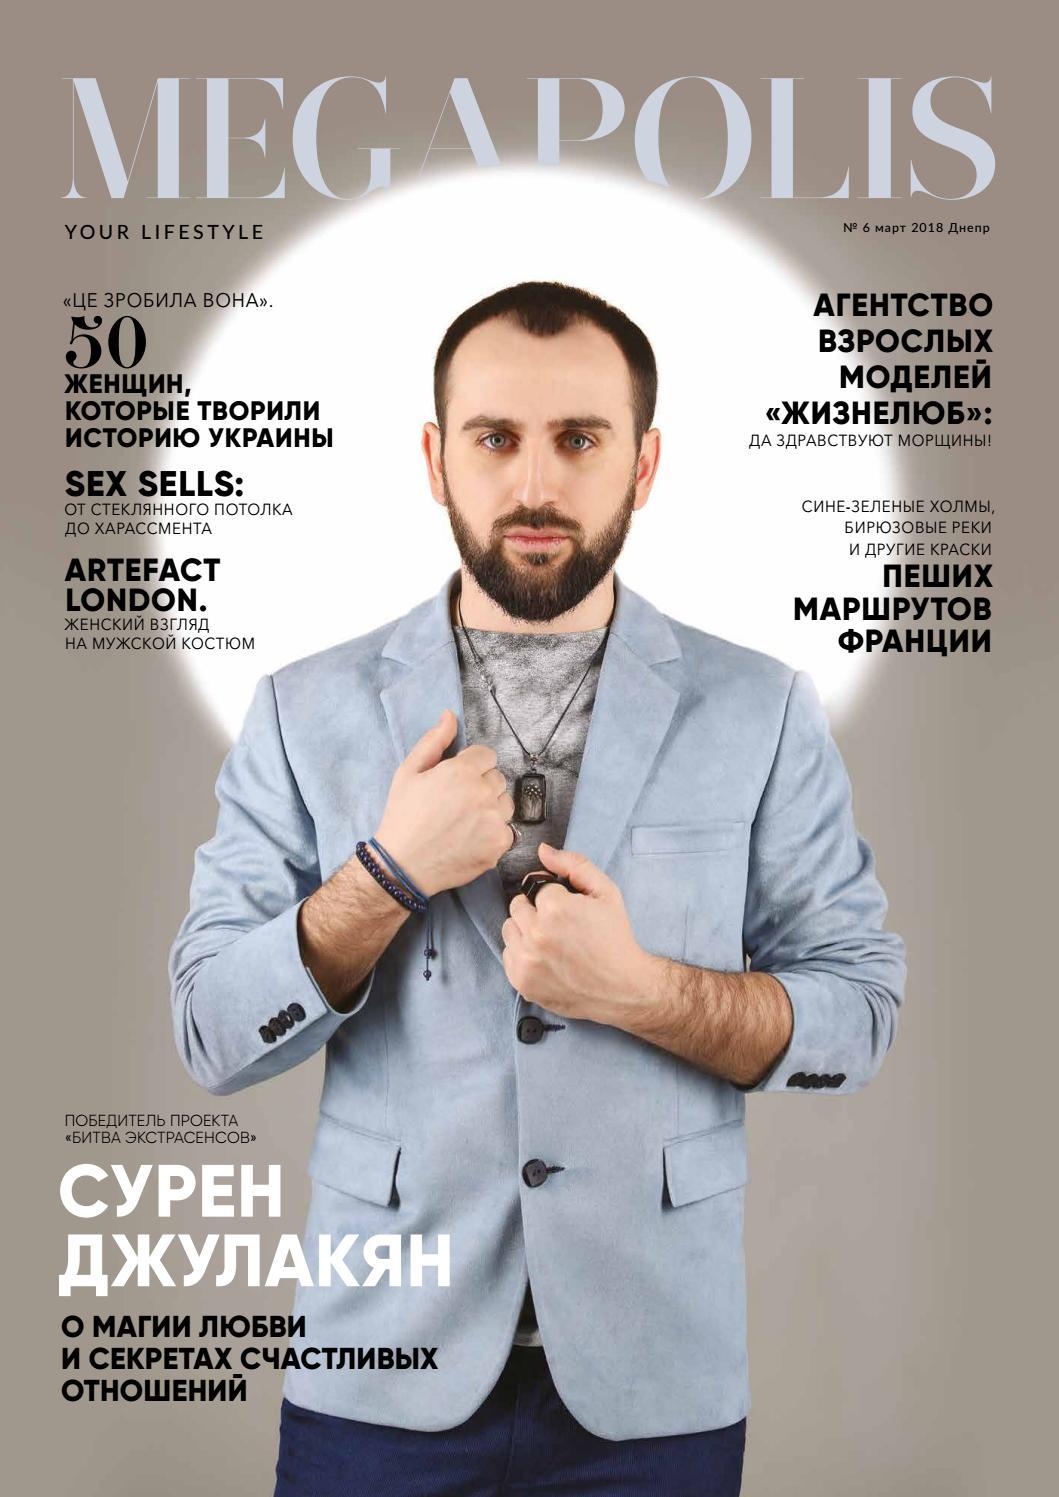 bf72bffec March'18 by Megapolis Magazine Dnepr - issuu